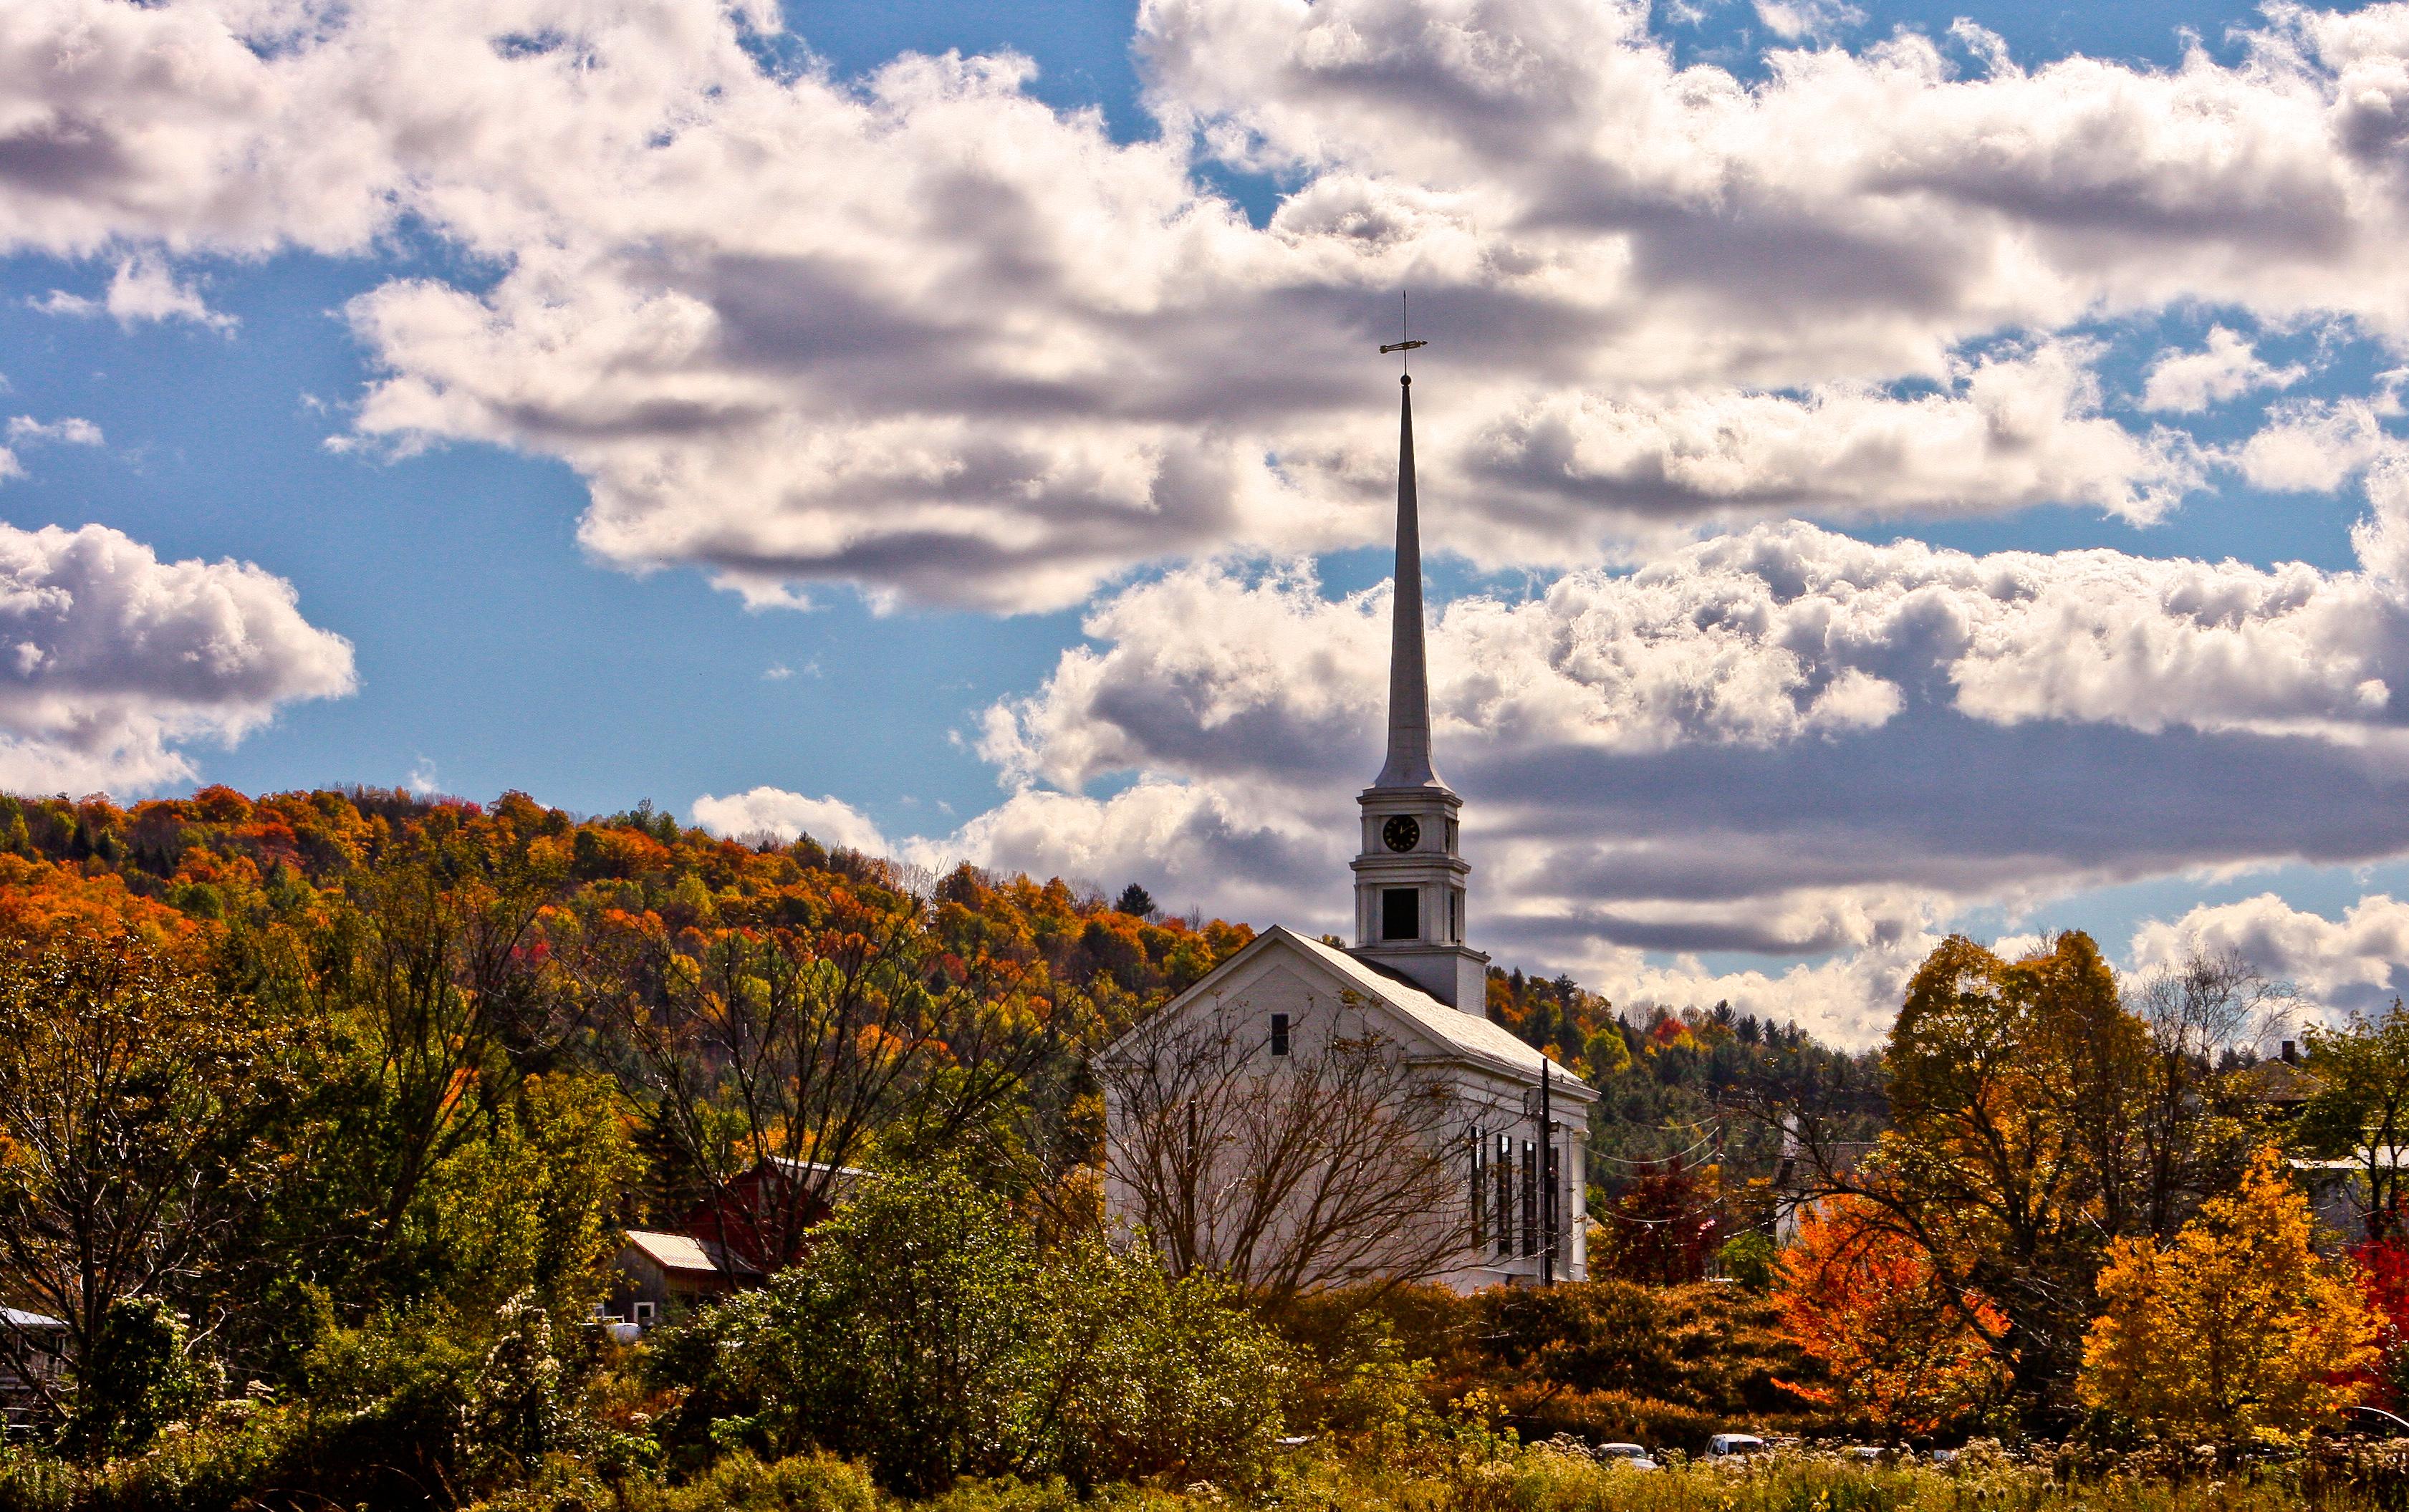 New England | Familypedia | FANDOM powered by Wikia